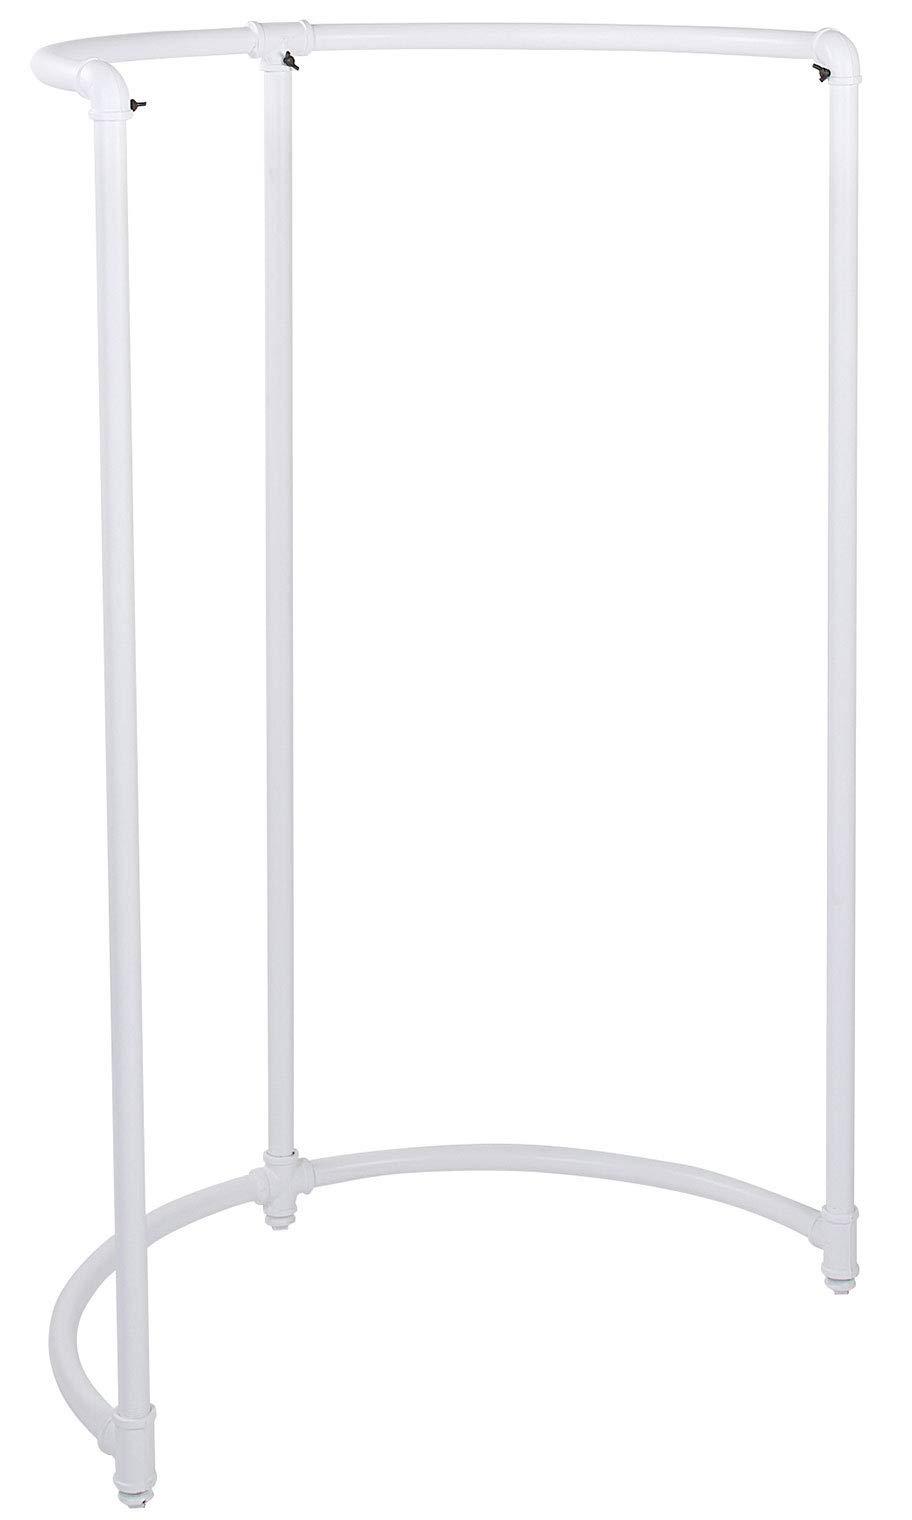 SSWBasics Boutique White Pipe Half Round Clothing Rack - 35''W x 35'''' D x 54''H